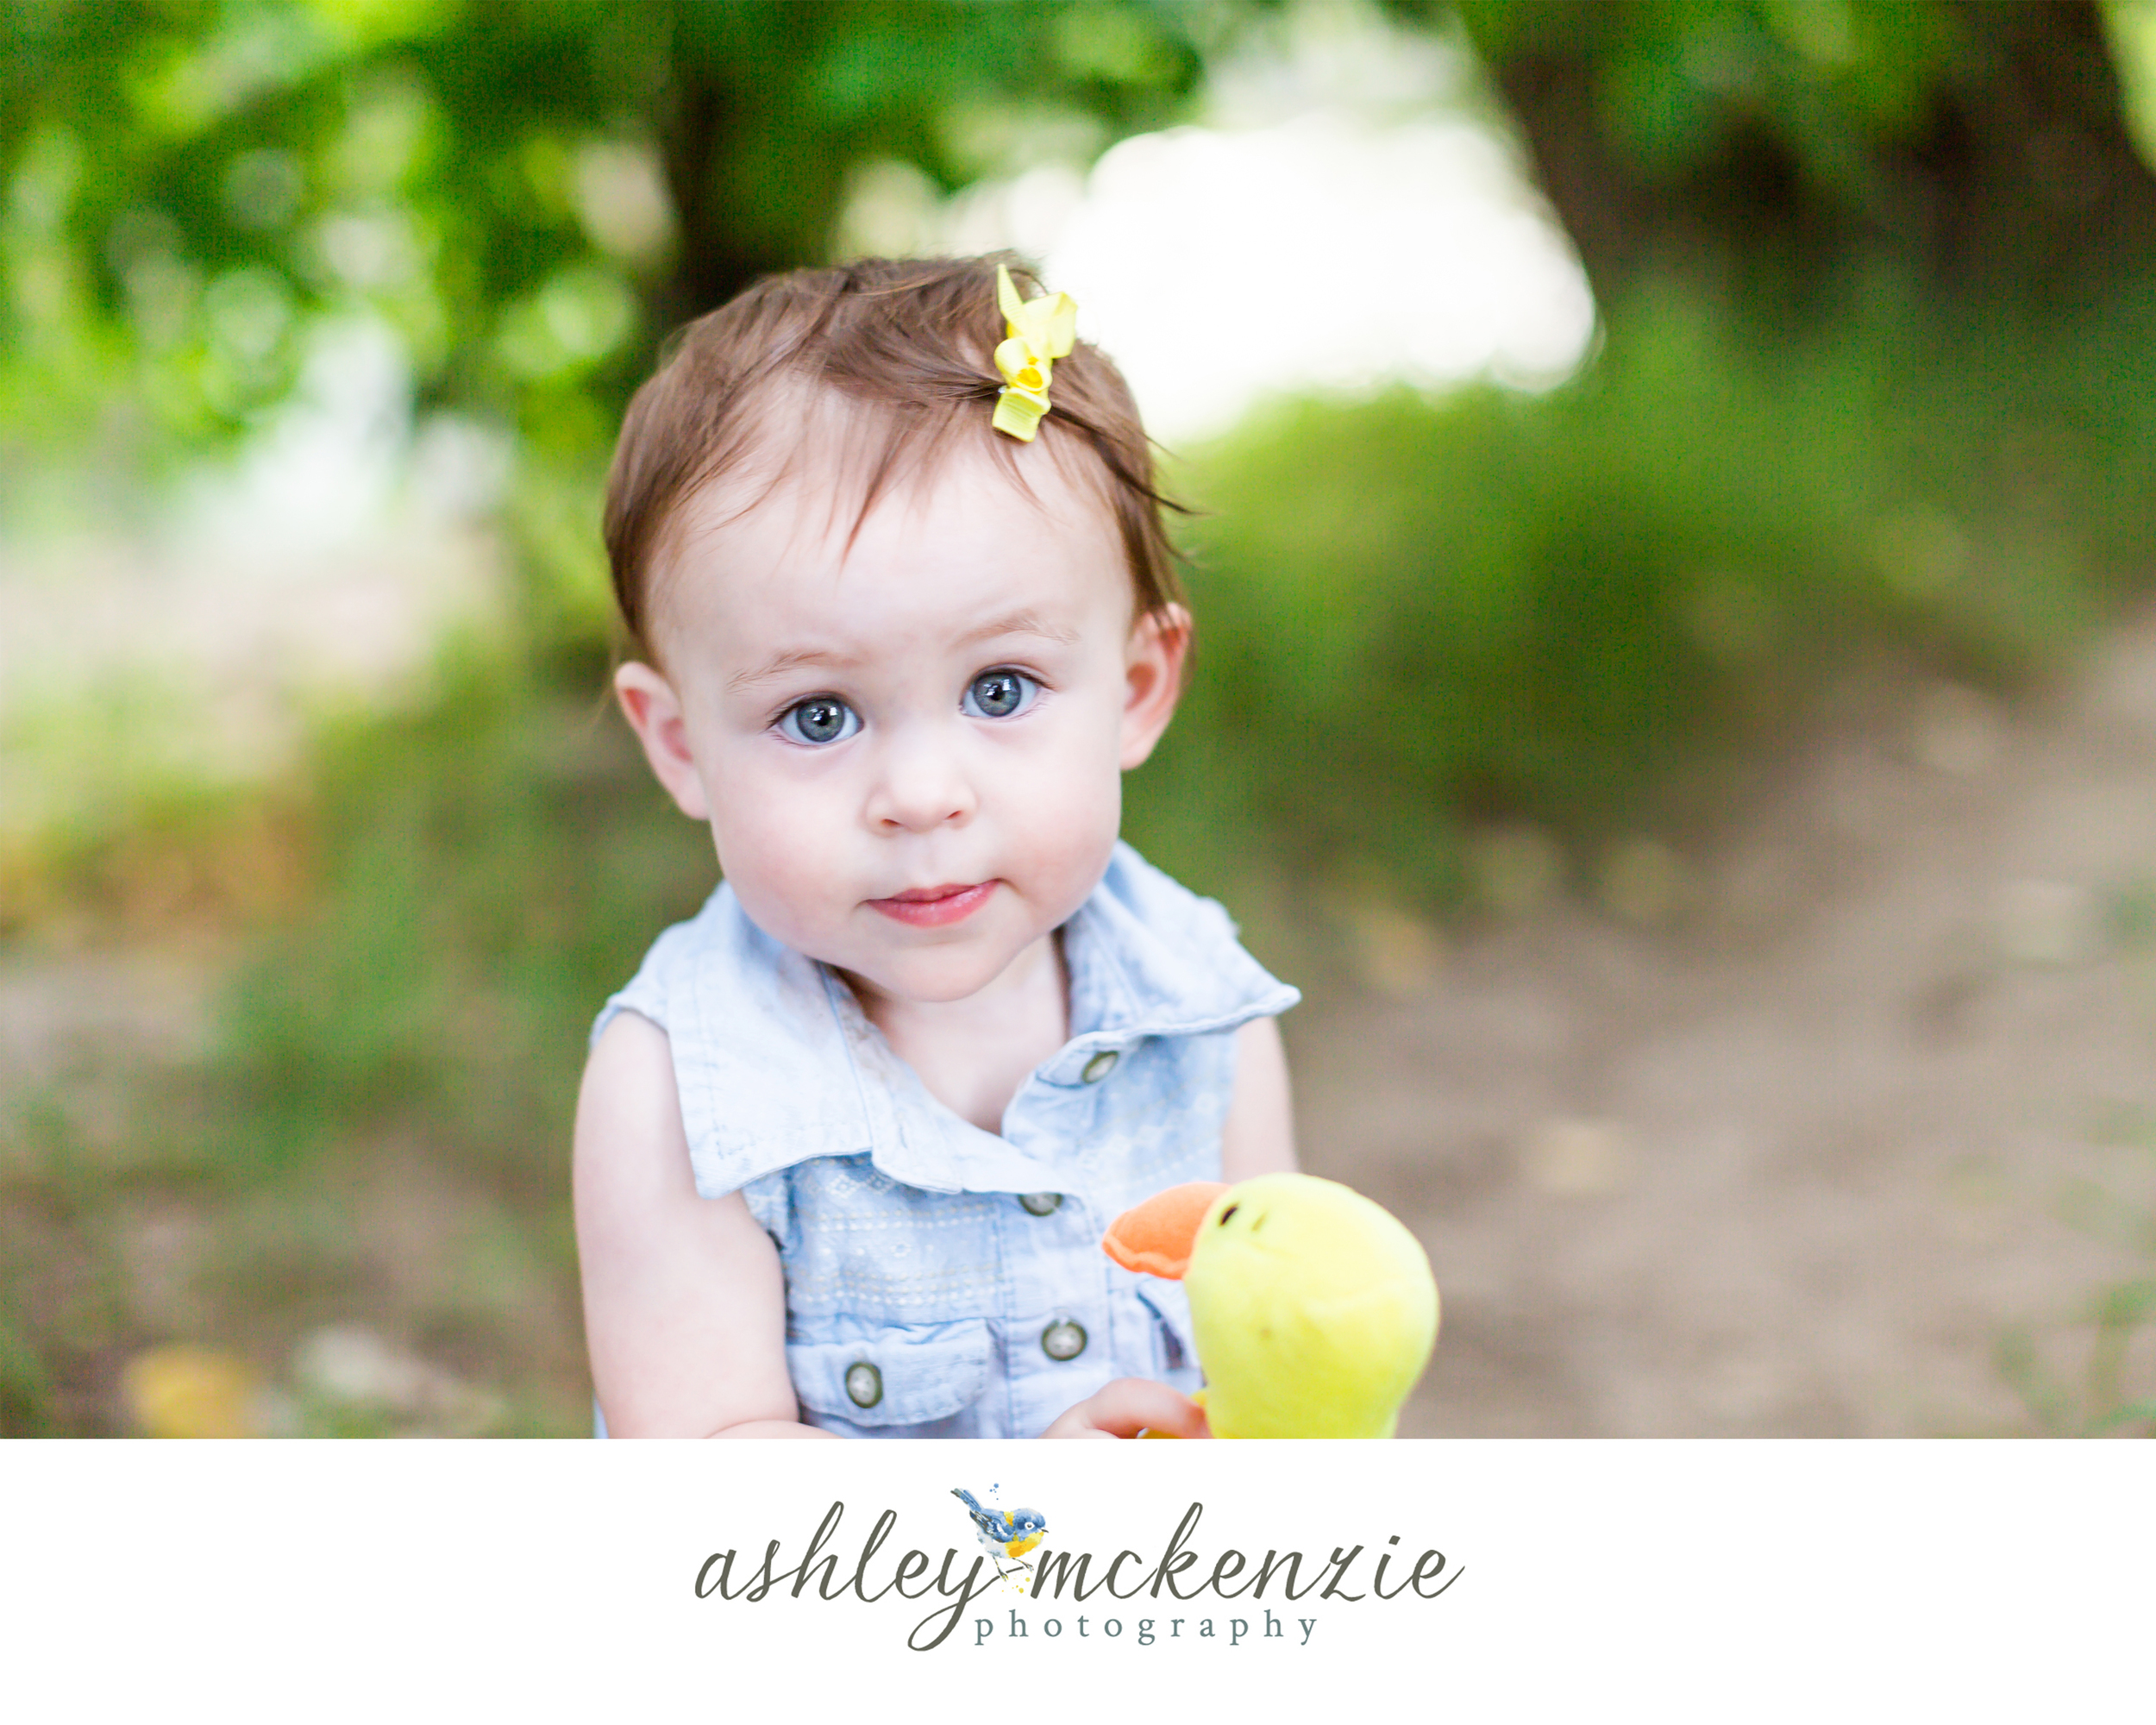 Photos By: Ashley McKenzie Photography